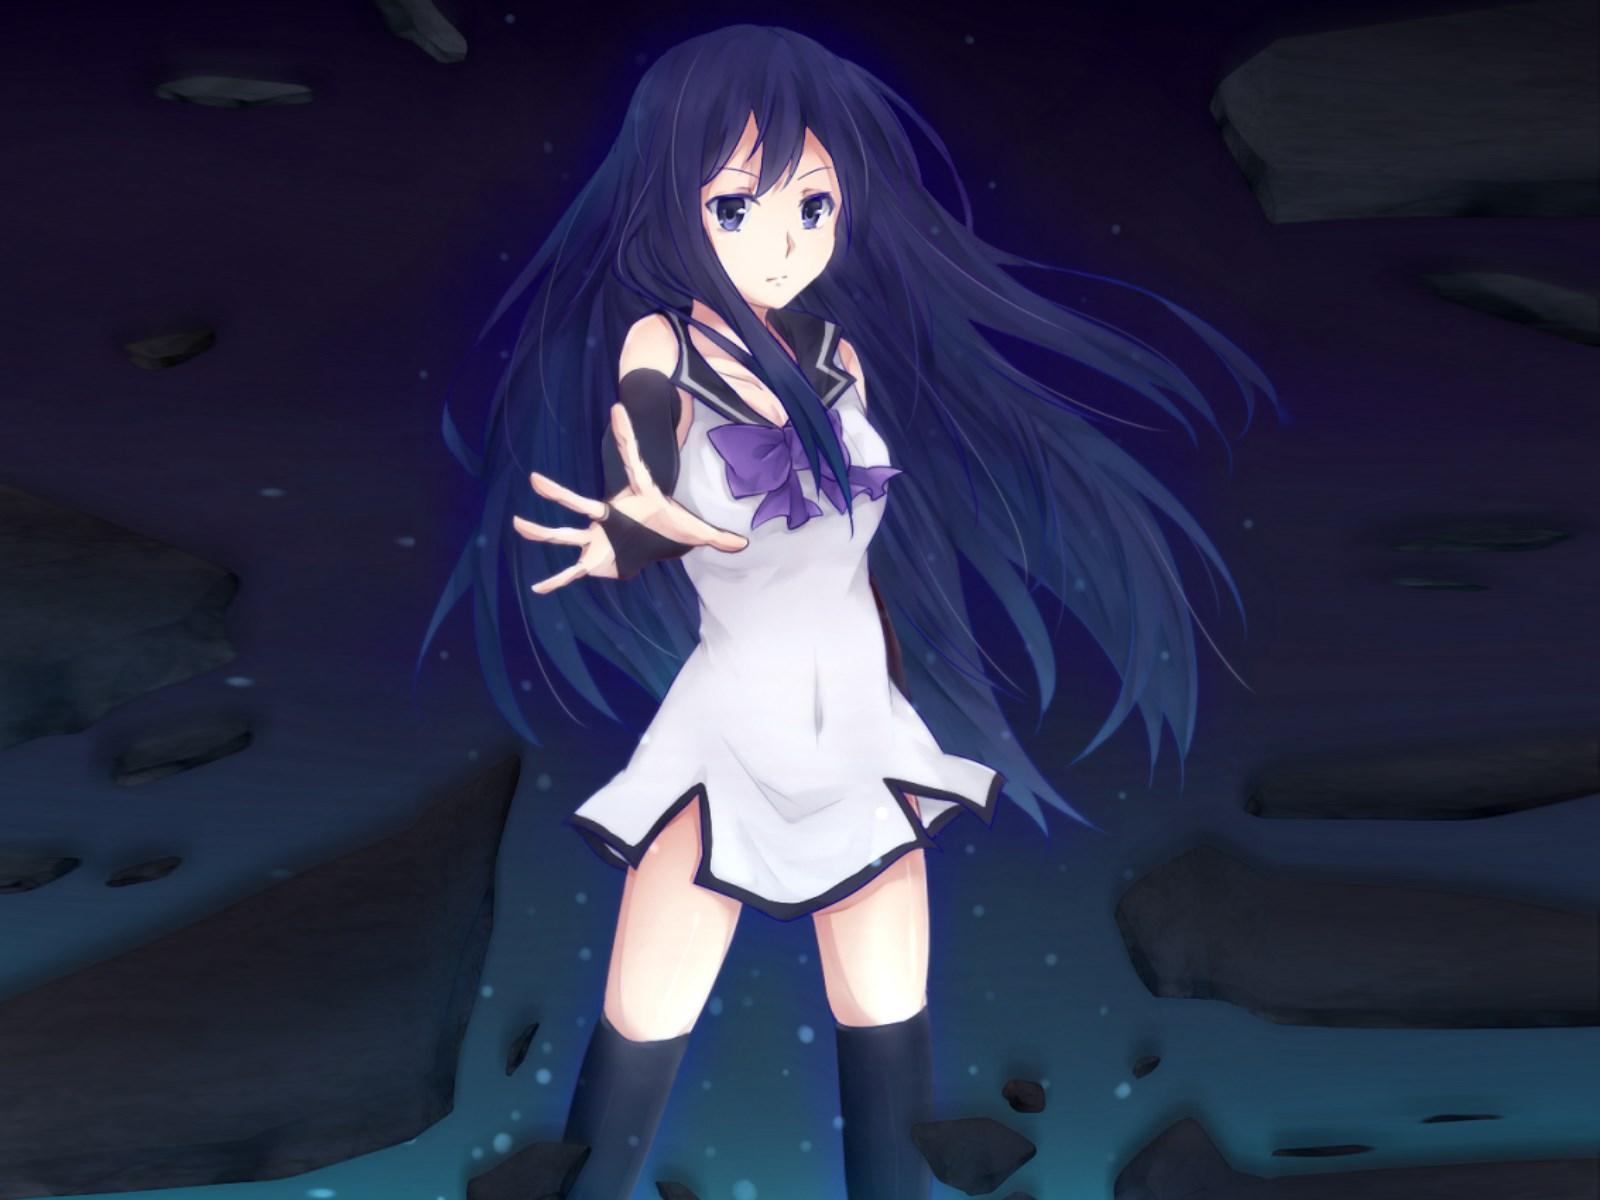 anime_wallpaper_Brynhildr_in_the_Darkness_19199.jpg